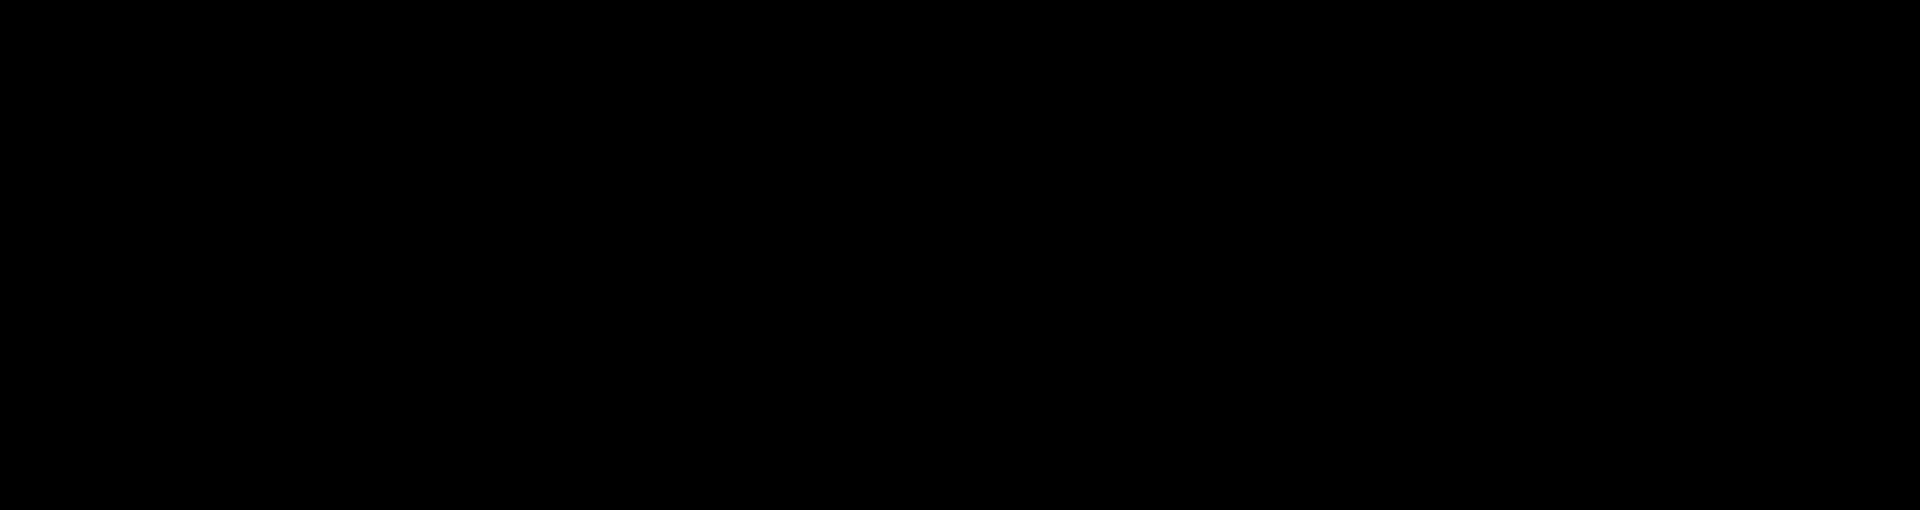 image3-patern